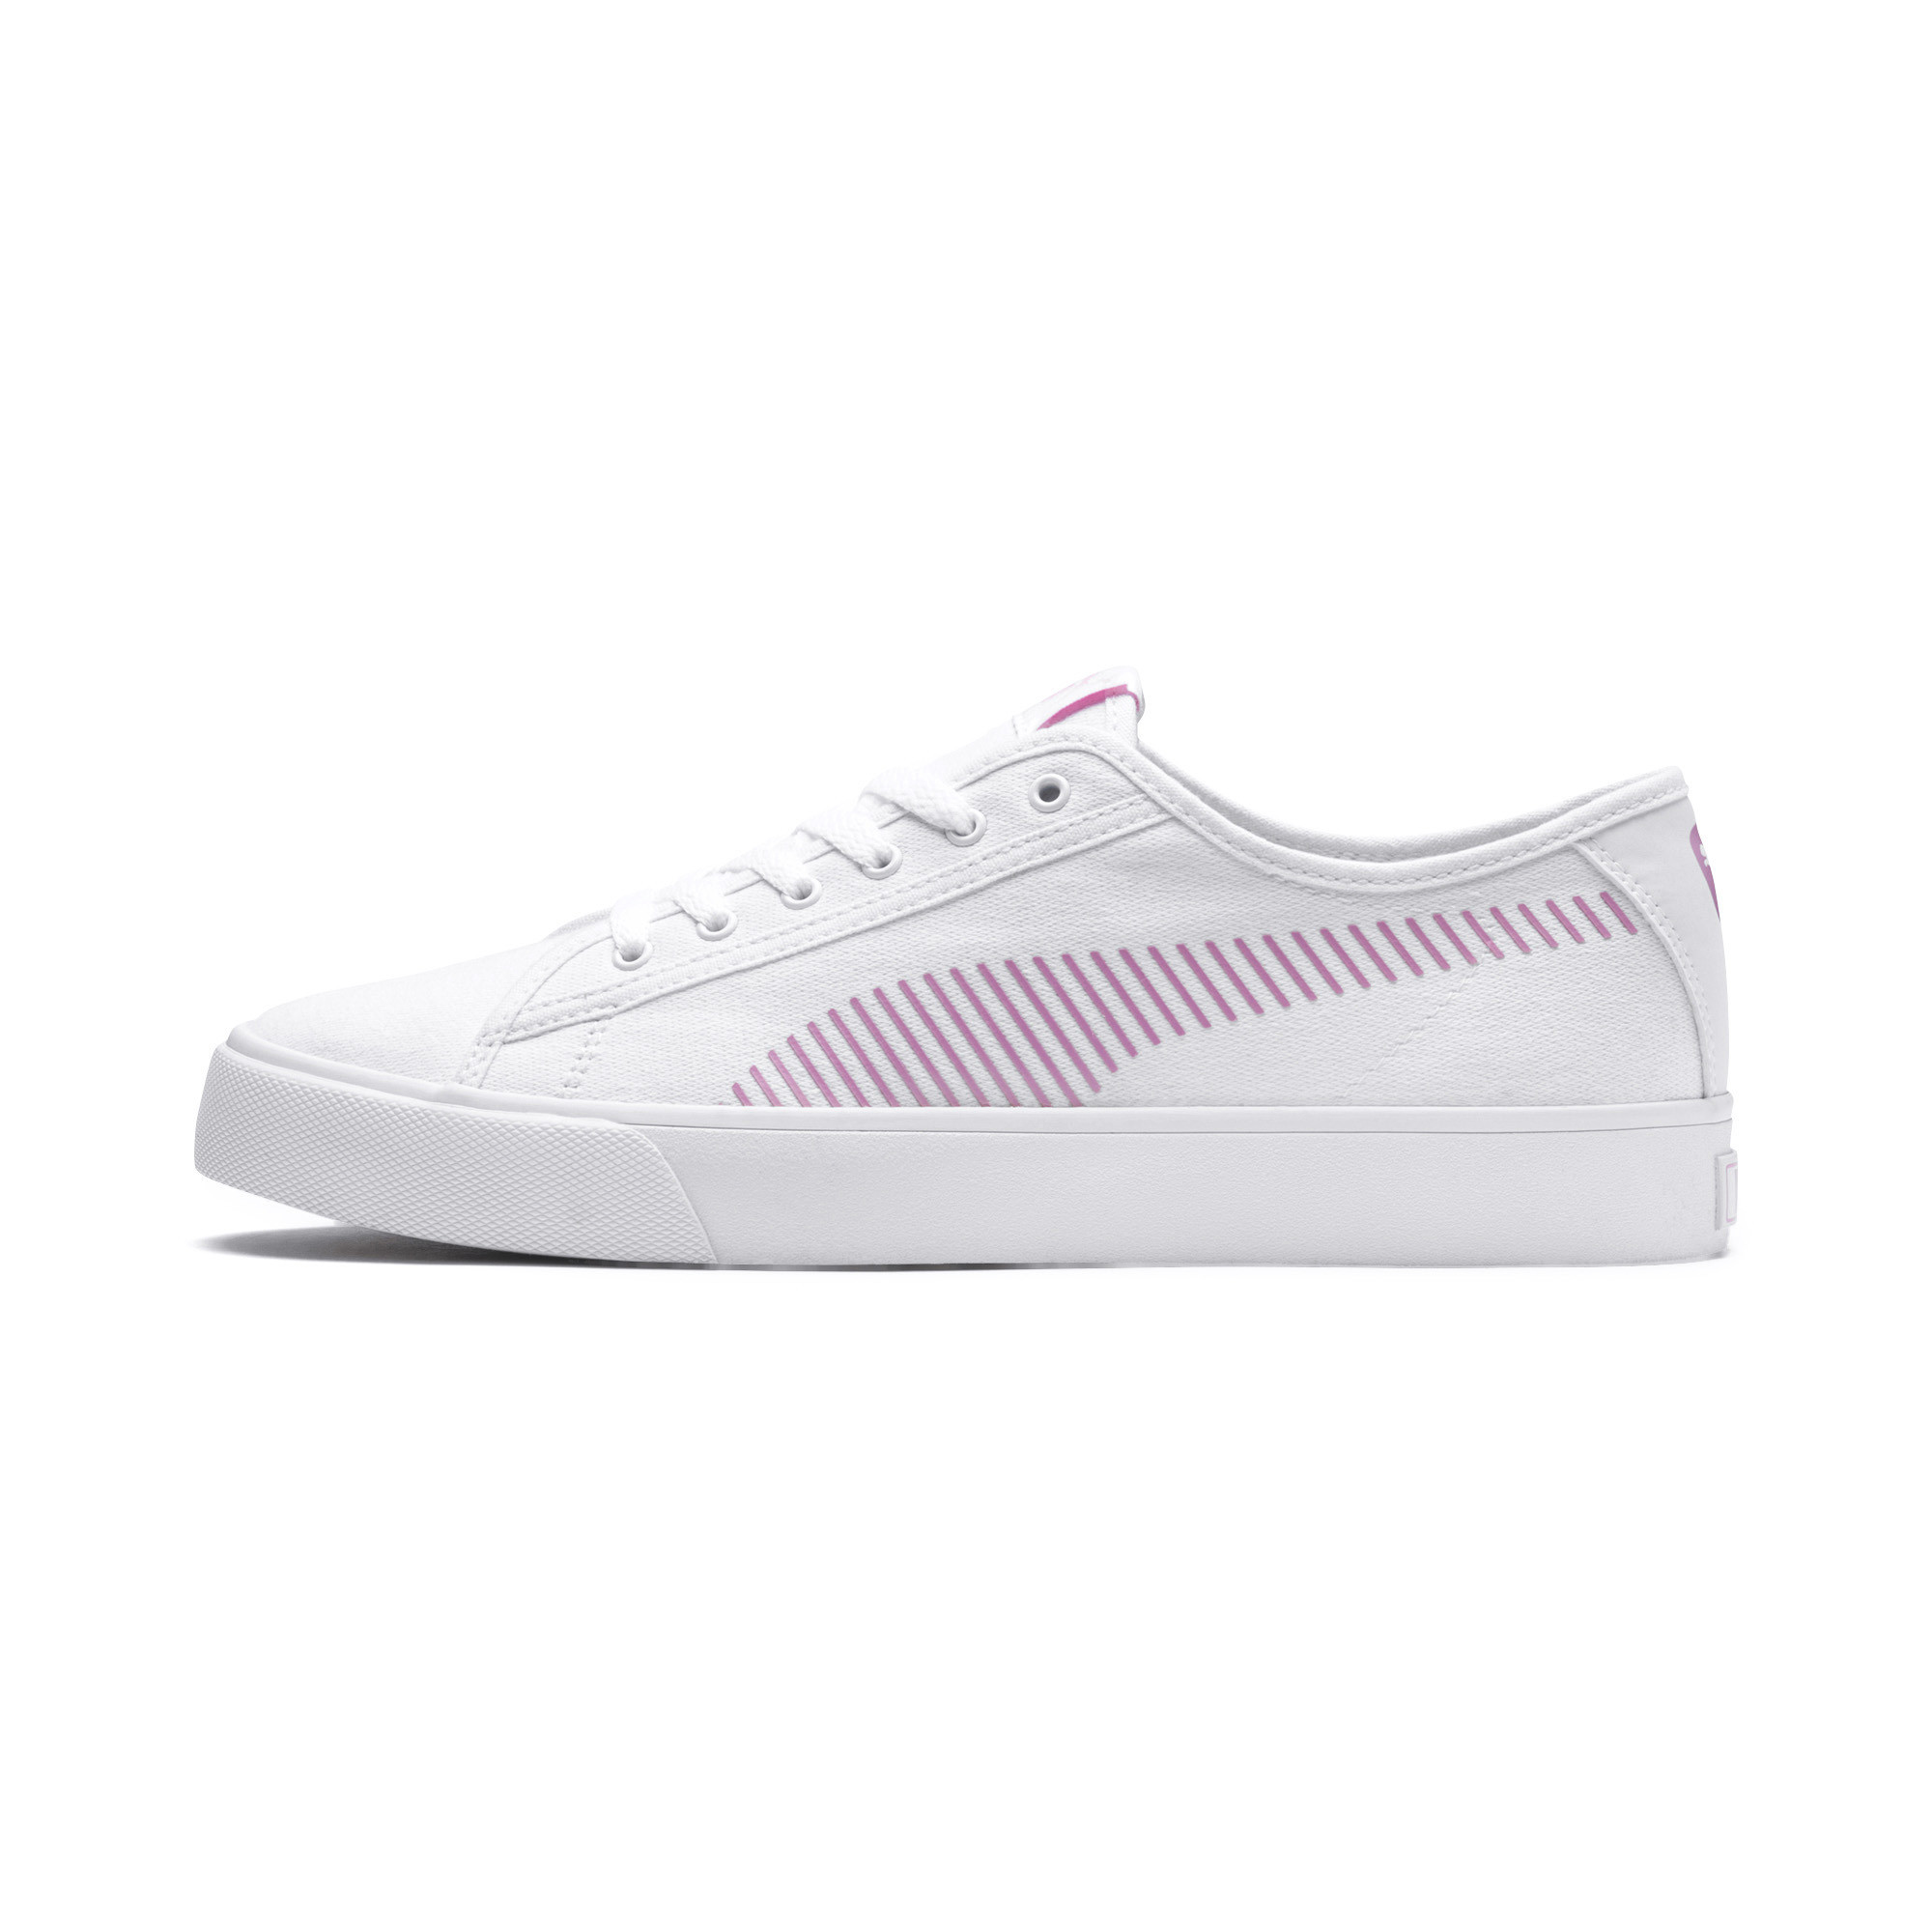 PUMA-Bari-Sneakers-Men-Shoe-Basics thumbnail 8